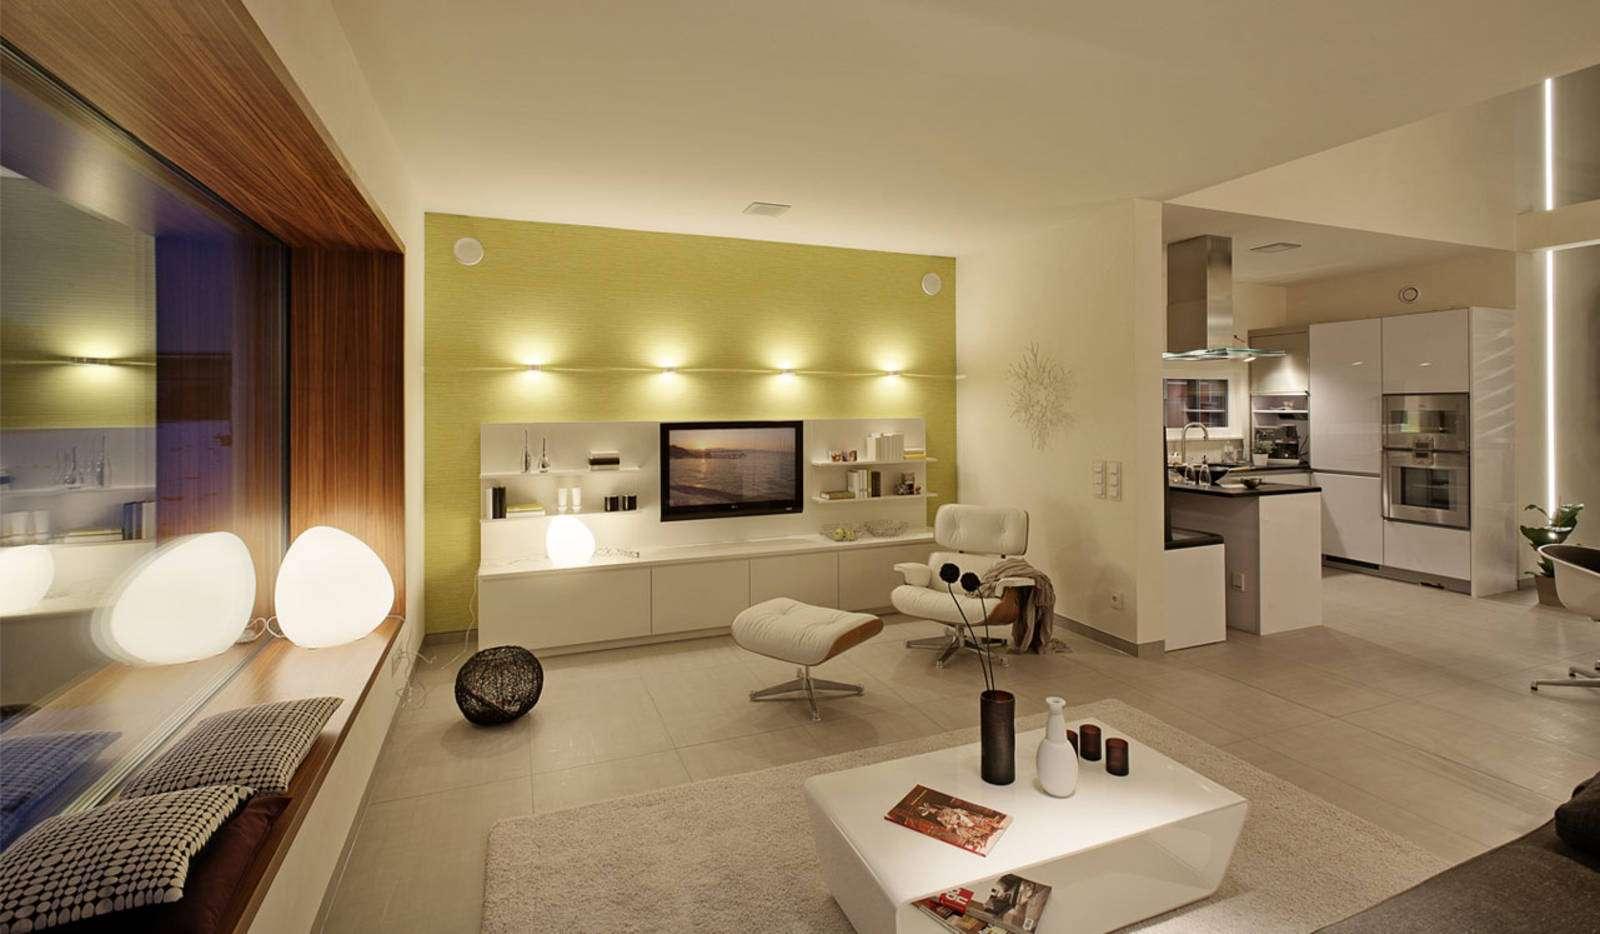 luxhaus musterhaus n rnberg luxhaus vertrieb gmbh co kg anbieter. Black Bedroom Furniture Sets. Home Design Ideas